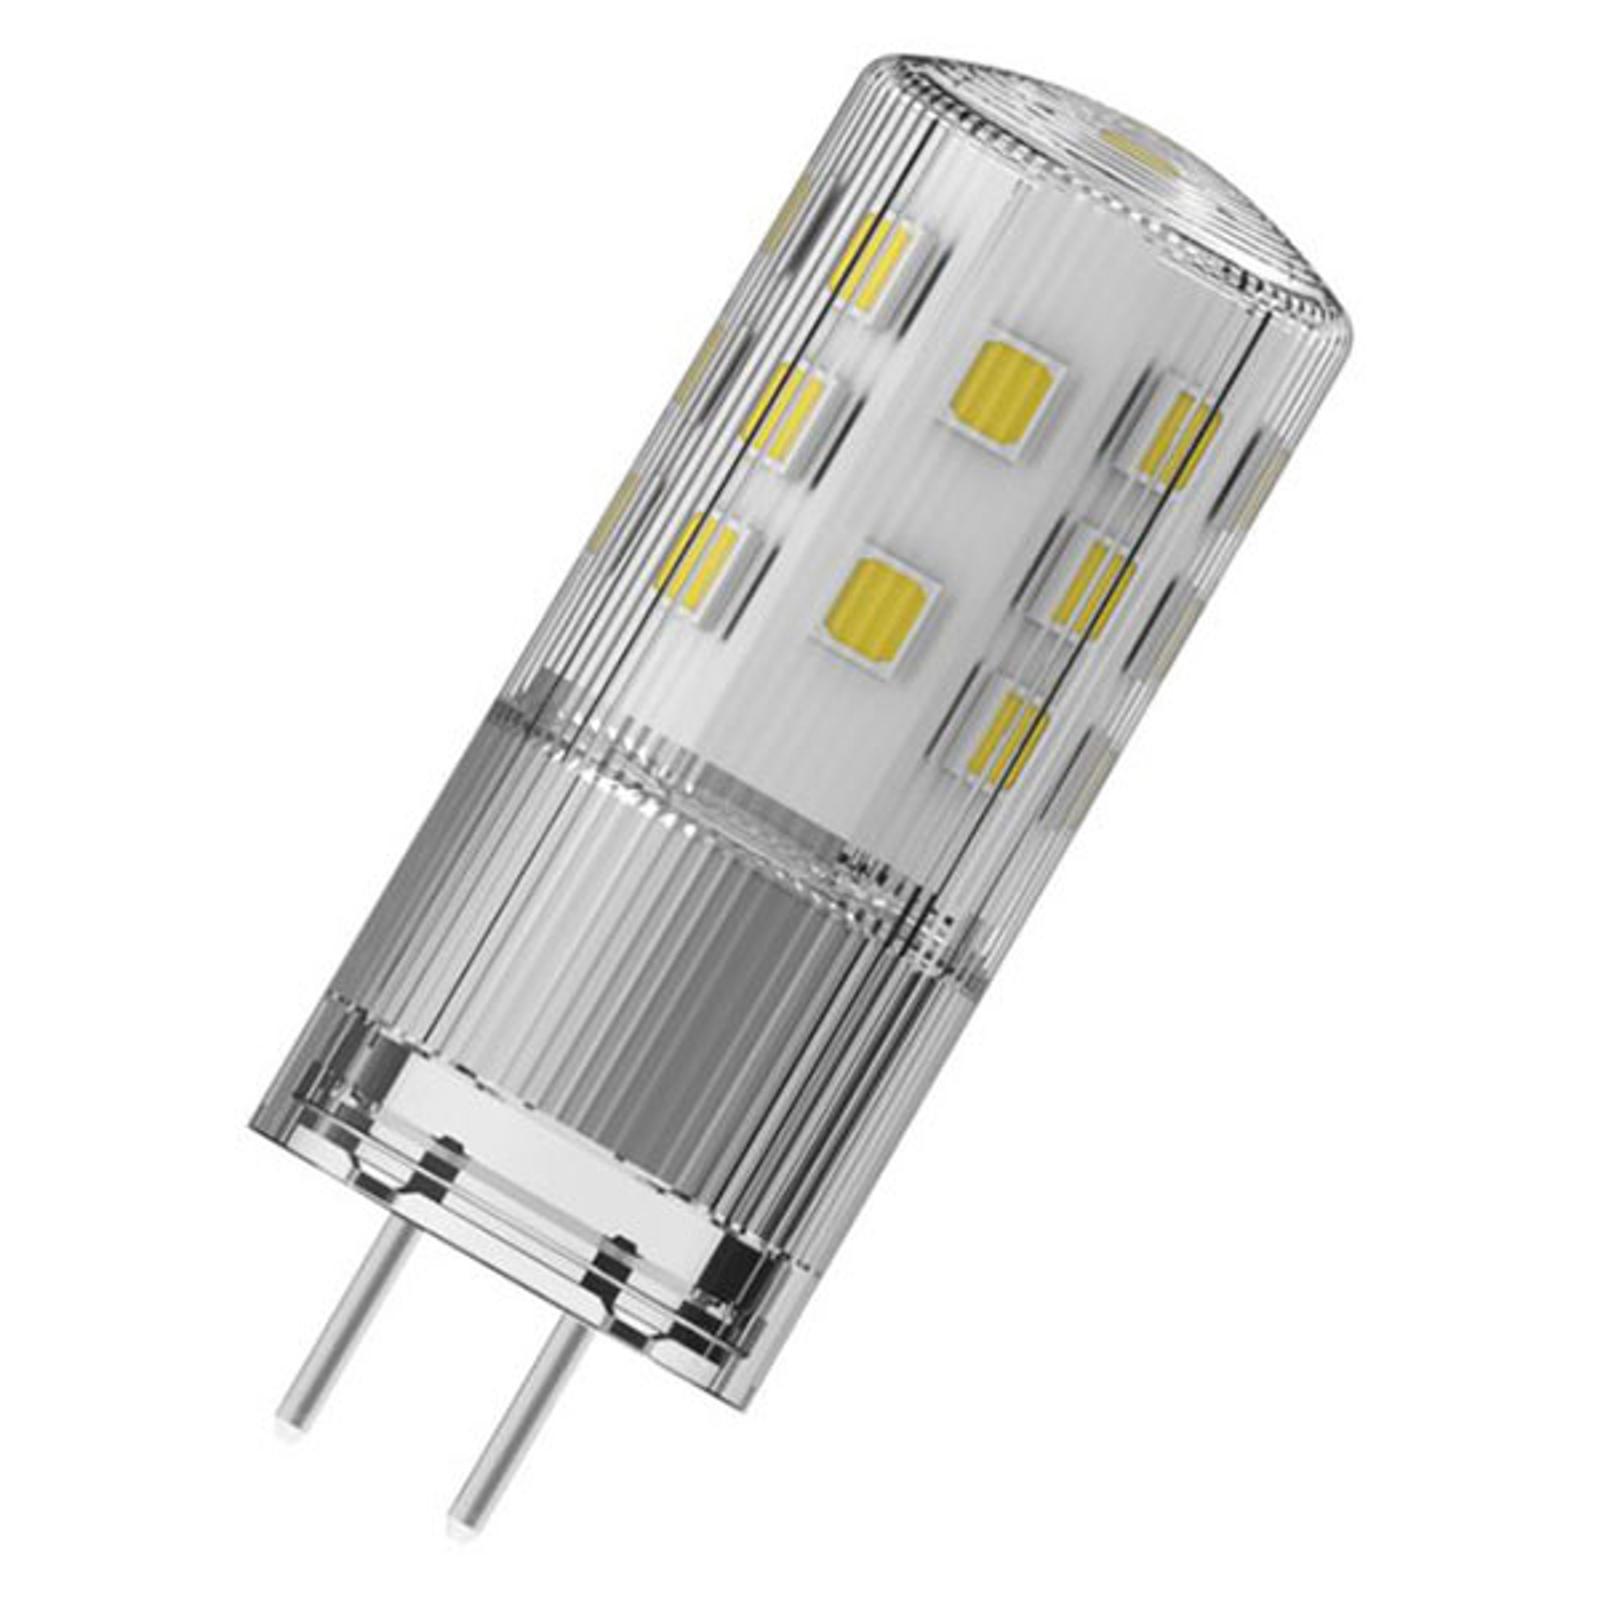 OSRAM LED-stiftpære GY6,35 4 W, varmhvit